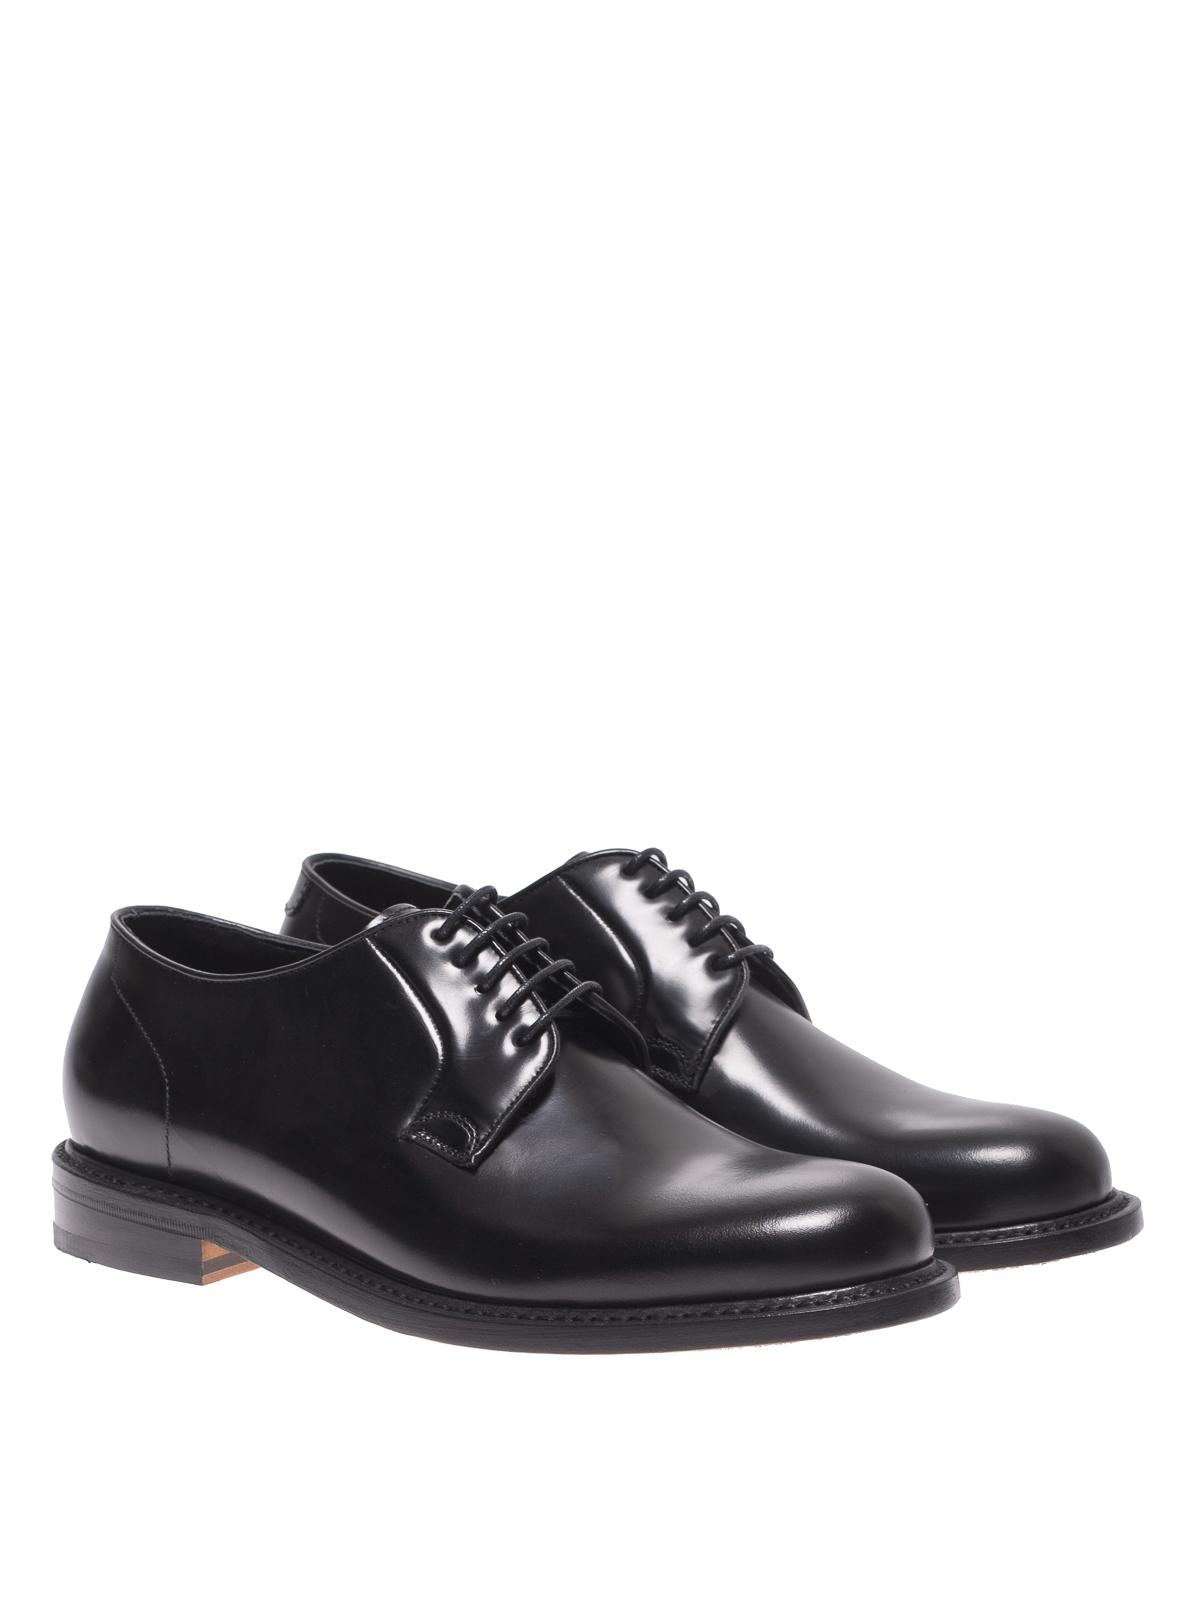 Zapatos Negro 1707 4234ho192black Berwick Clásicos OX0PkNw8n